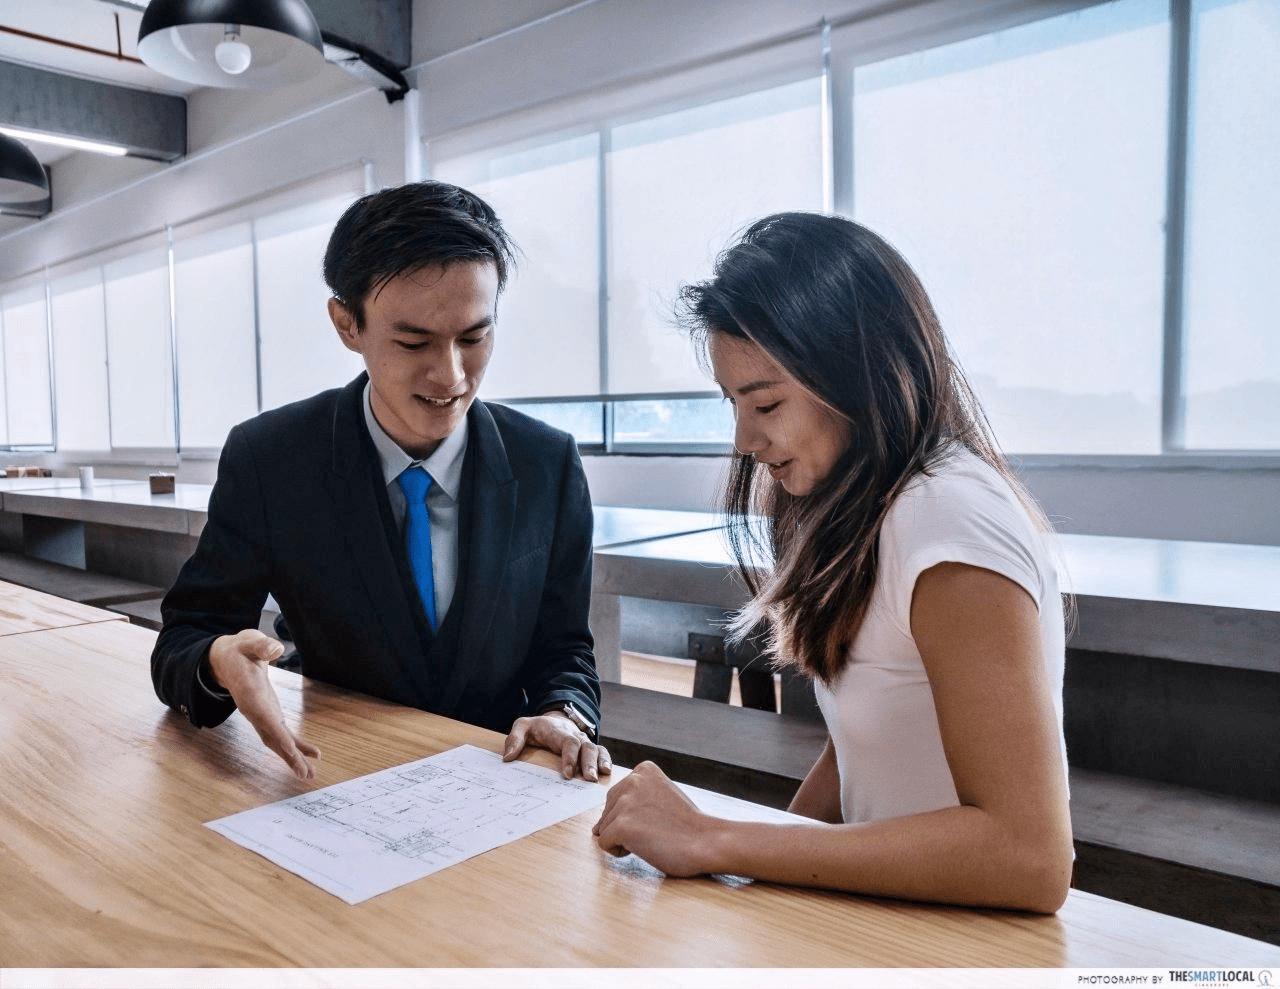 Relationship management Skill